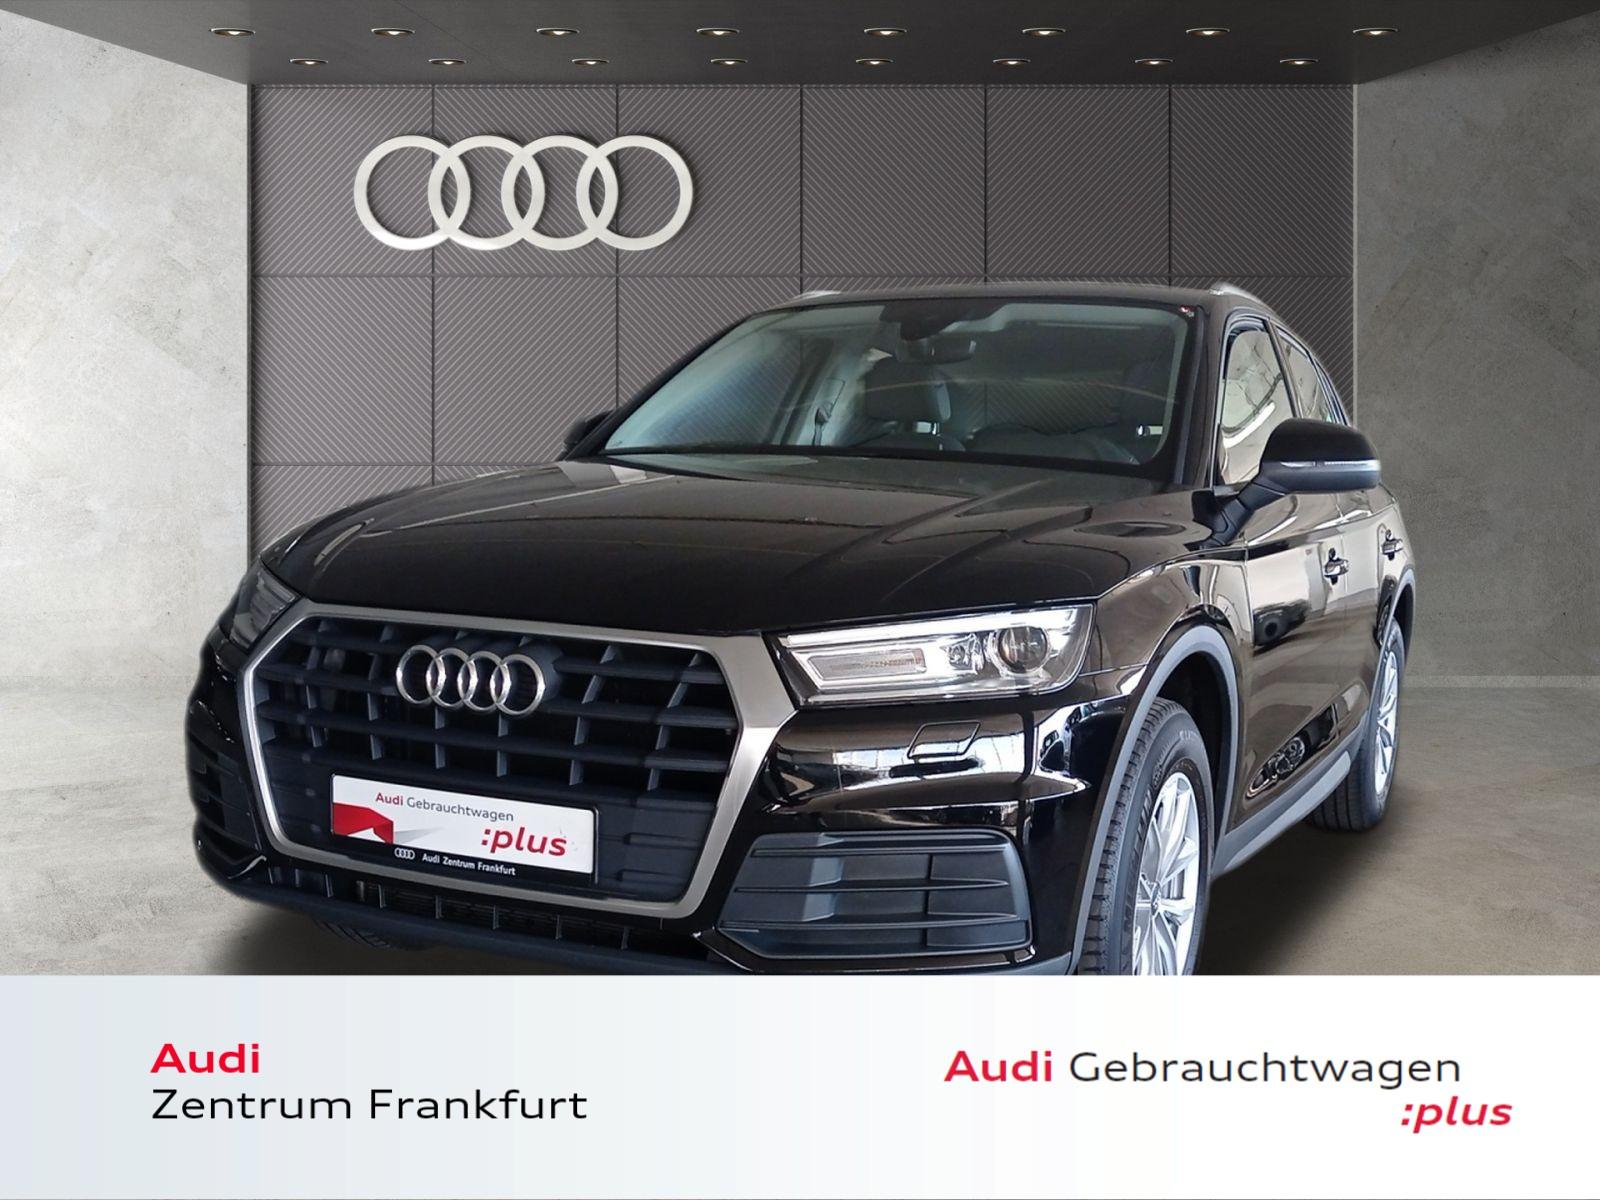 Audi Q5 2.0 TDI Xenon Navi PDC Tempomat, Jahr 2018, Diesel